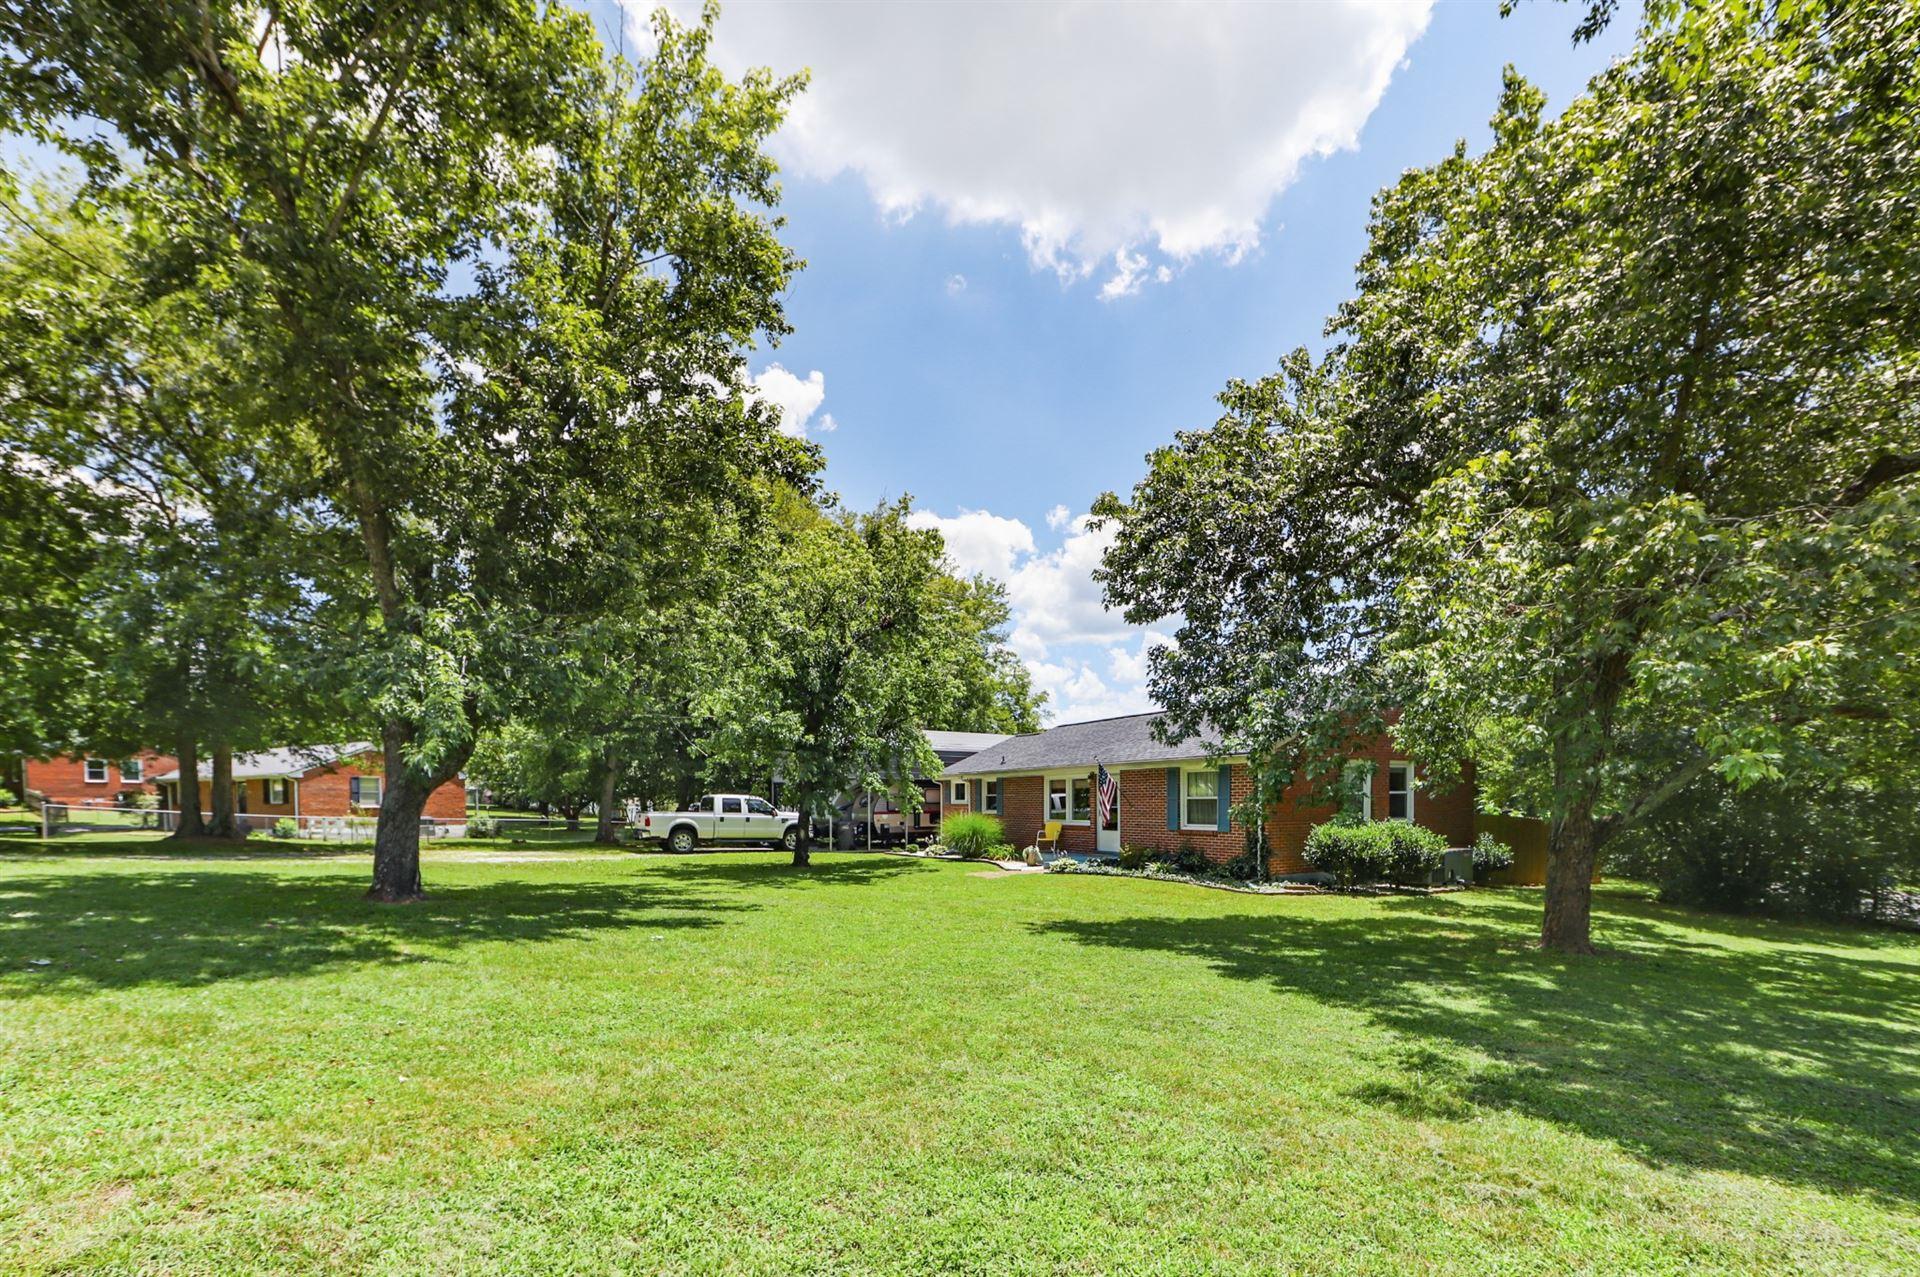 Photo of 201 Pleasant Dr, Columbia, TN 38401 (MLS # 2169958)